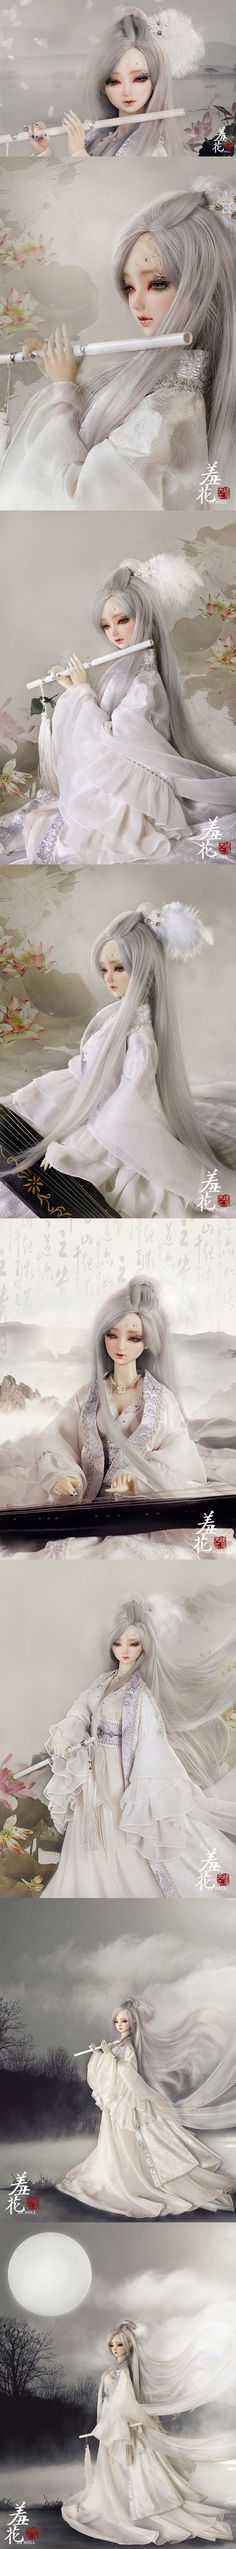 (AS Agency)BJD Yang YuHuan/Shy Girl 62cm Ball-Jointed Doll_SD size doll_Angell Studio_DOLL_Ball Jointed Dolls (BJD) company-Legenddoll